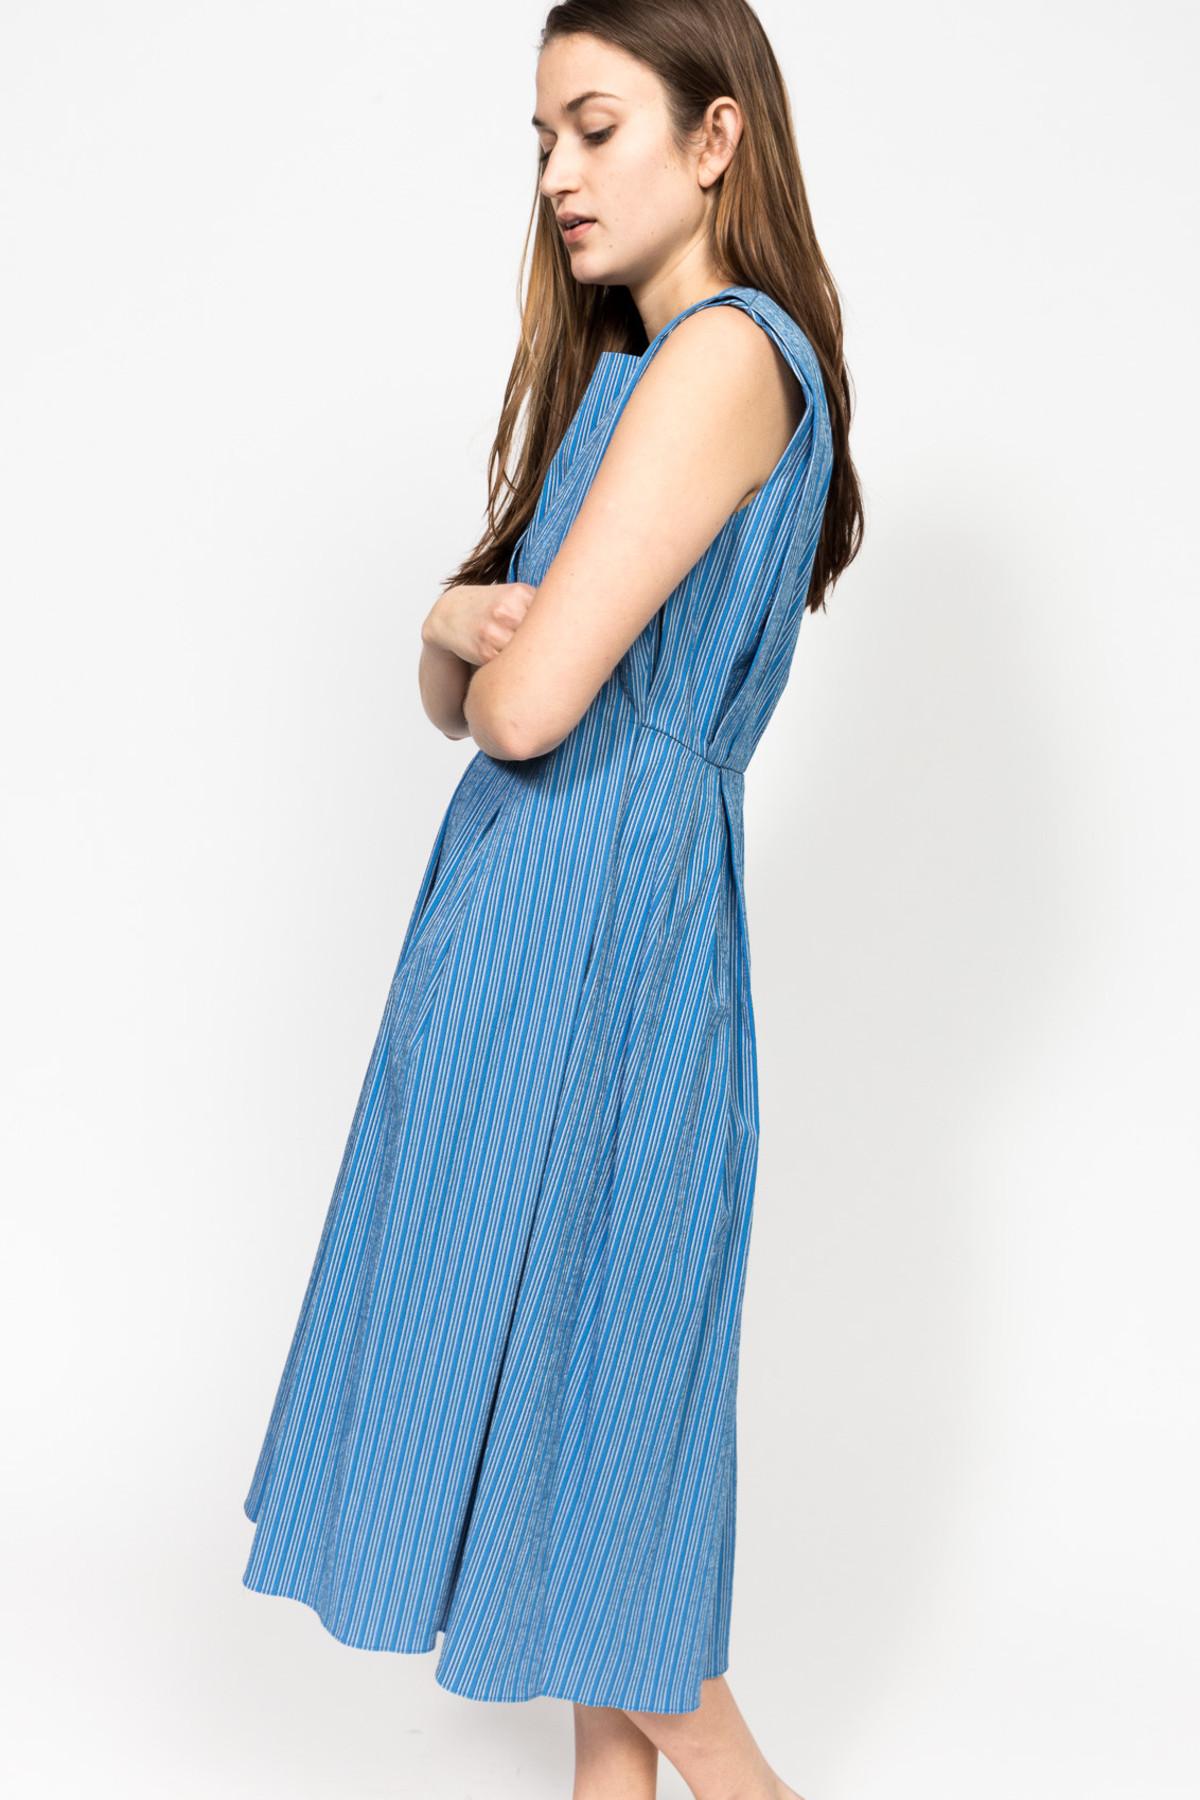 Trademark Shadow Stripe Tie Dress | Garmentory